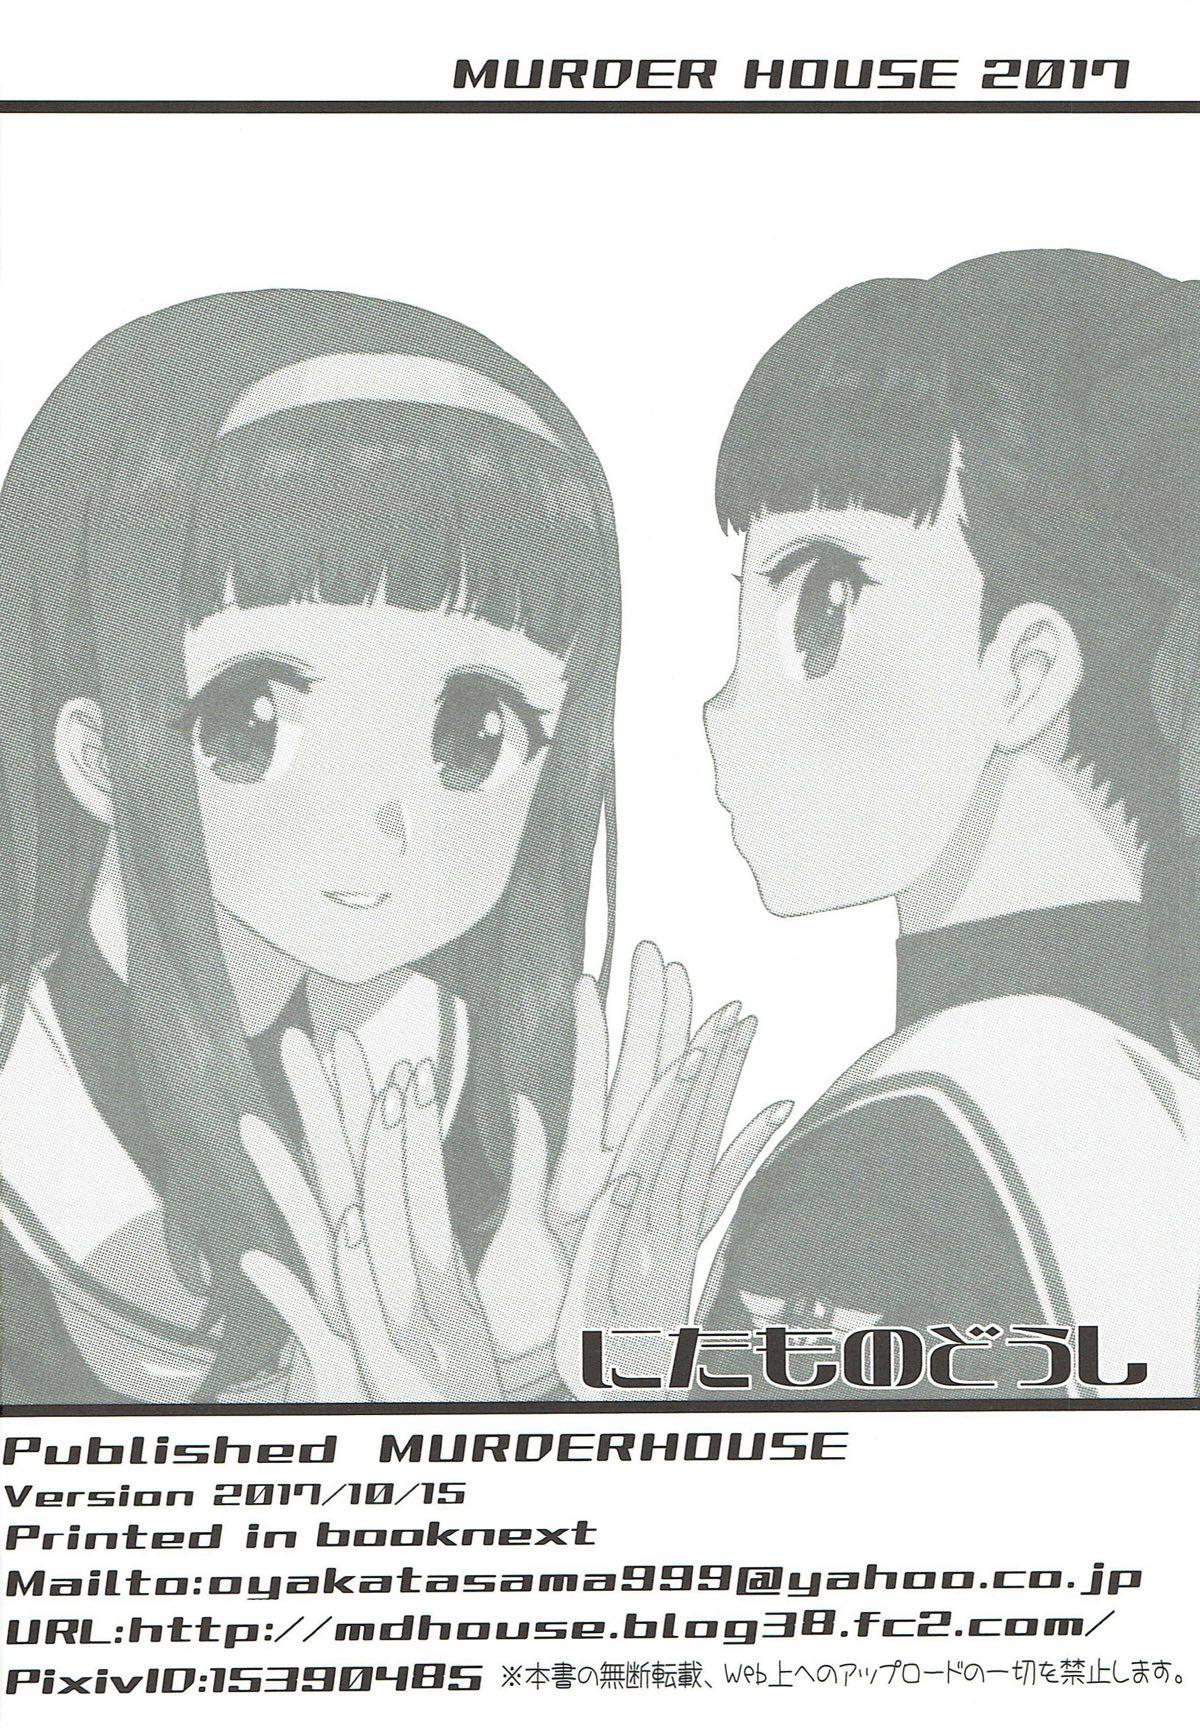 HentaiVN.net - Ảnh 19 - Nitamono Doushi - Oneshot